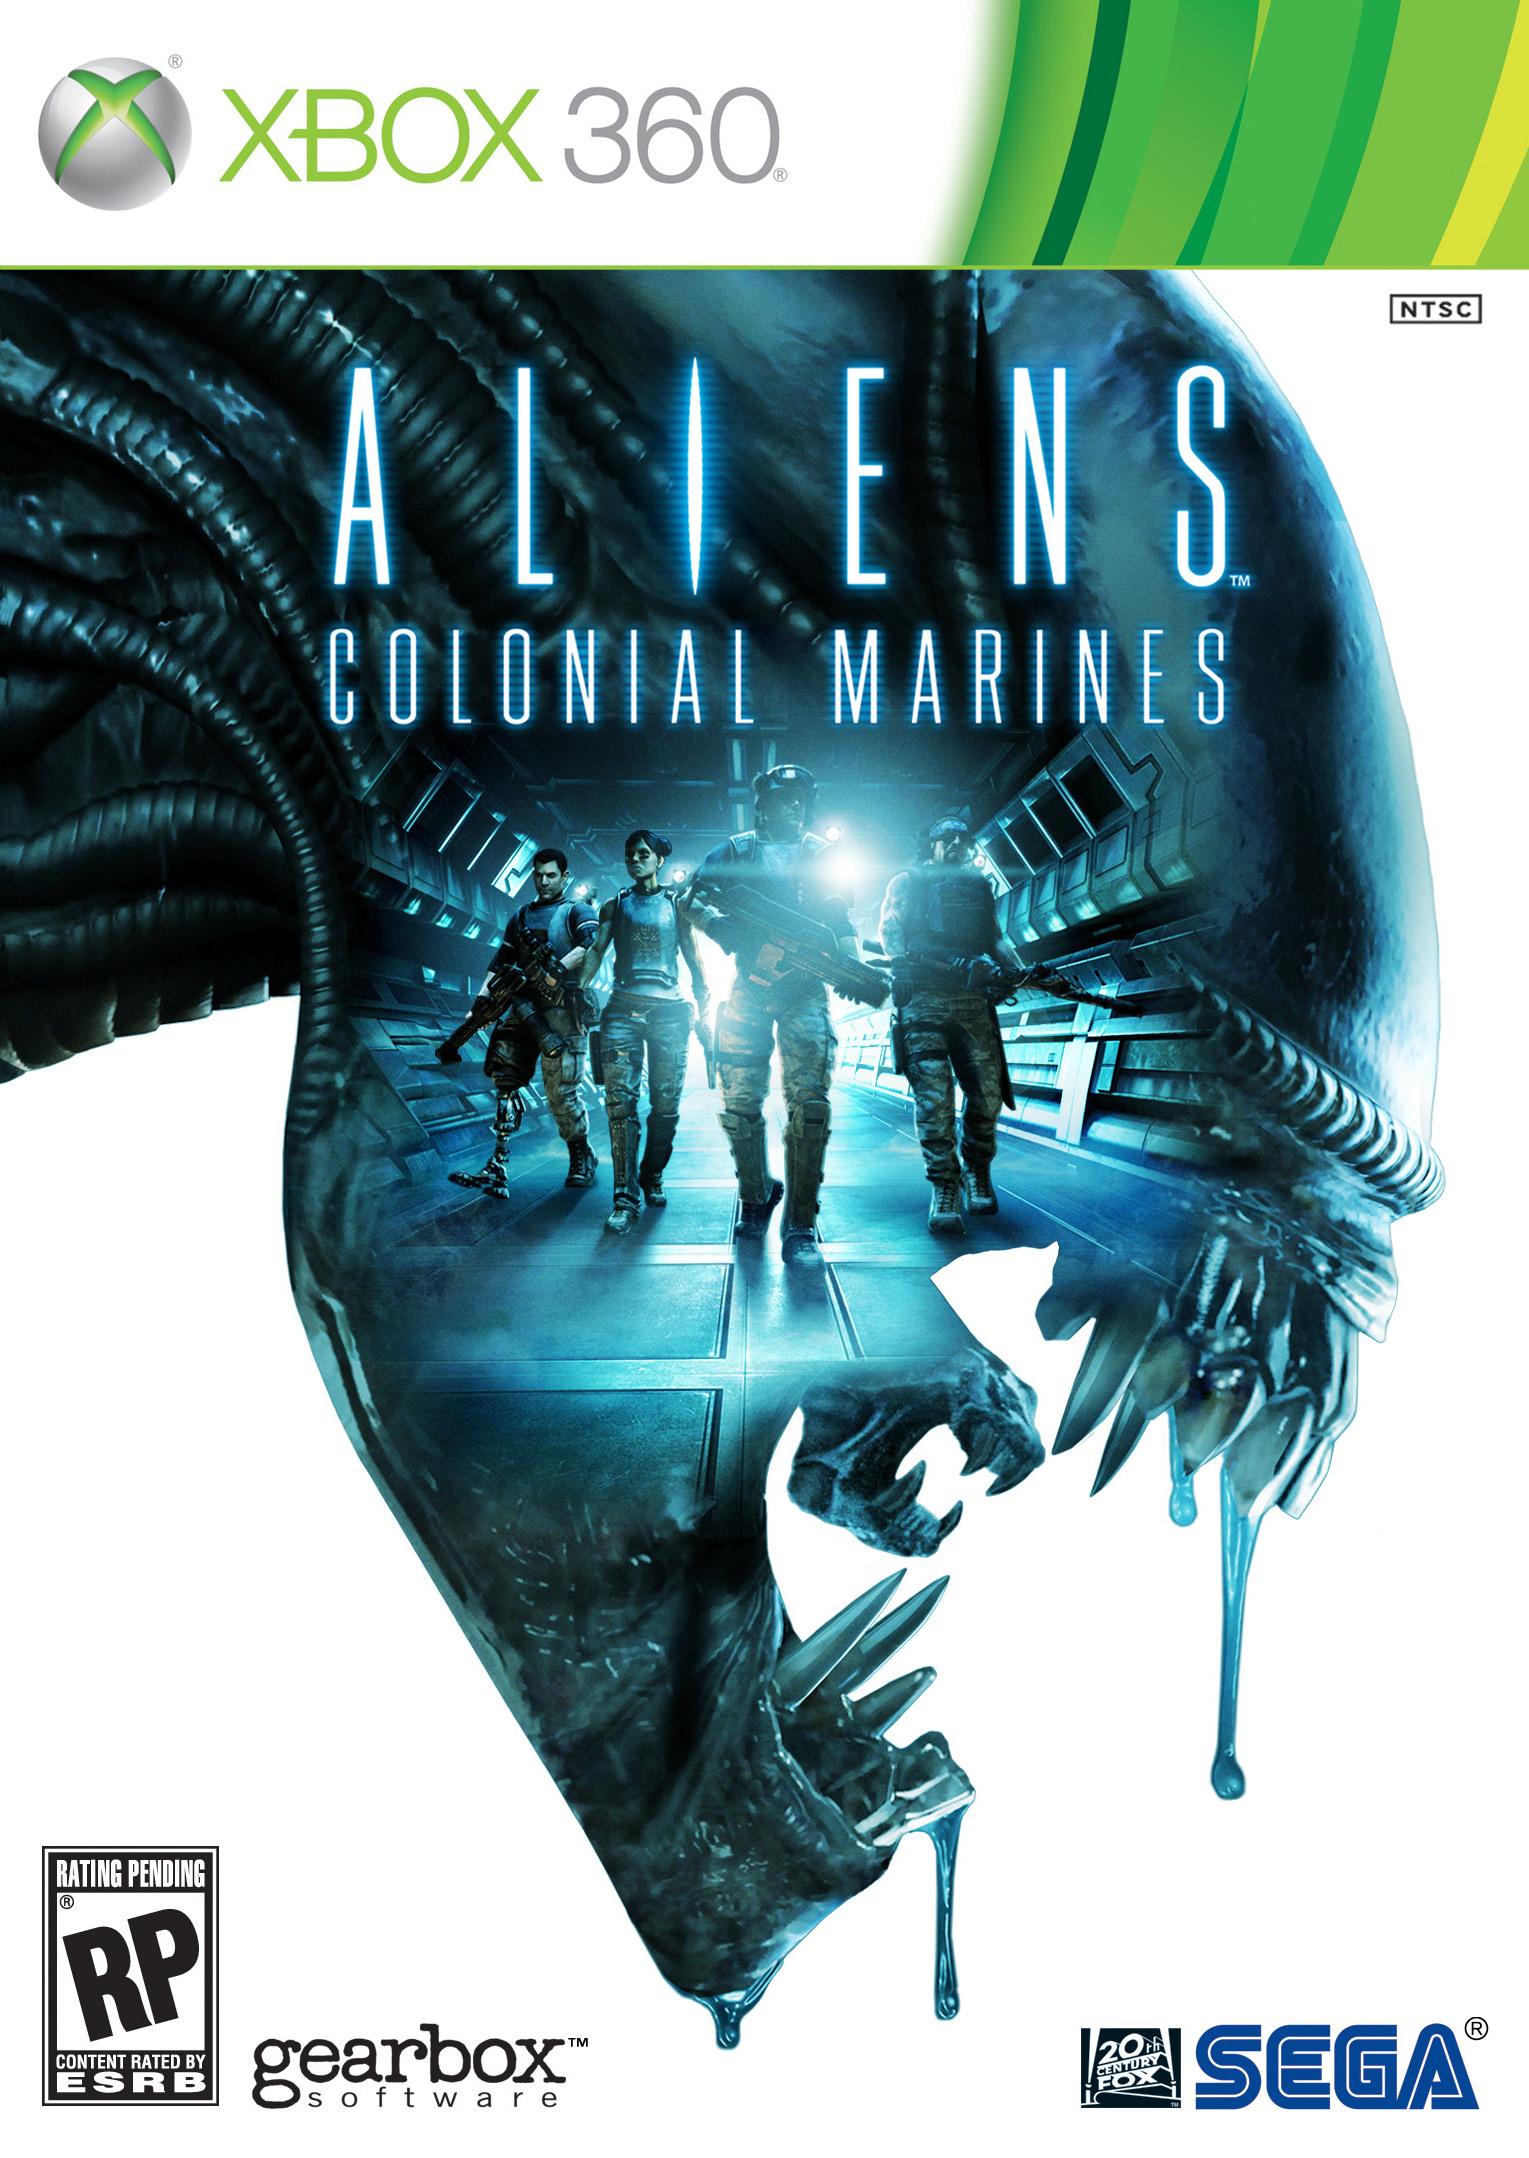 AliensColonialMarines360